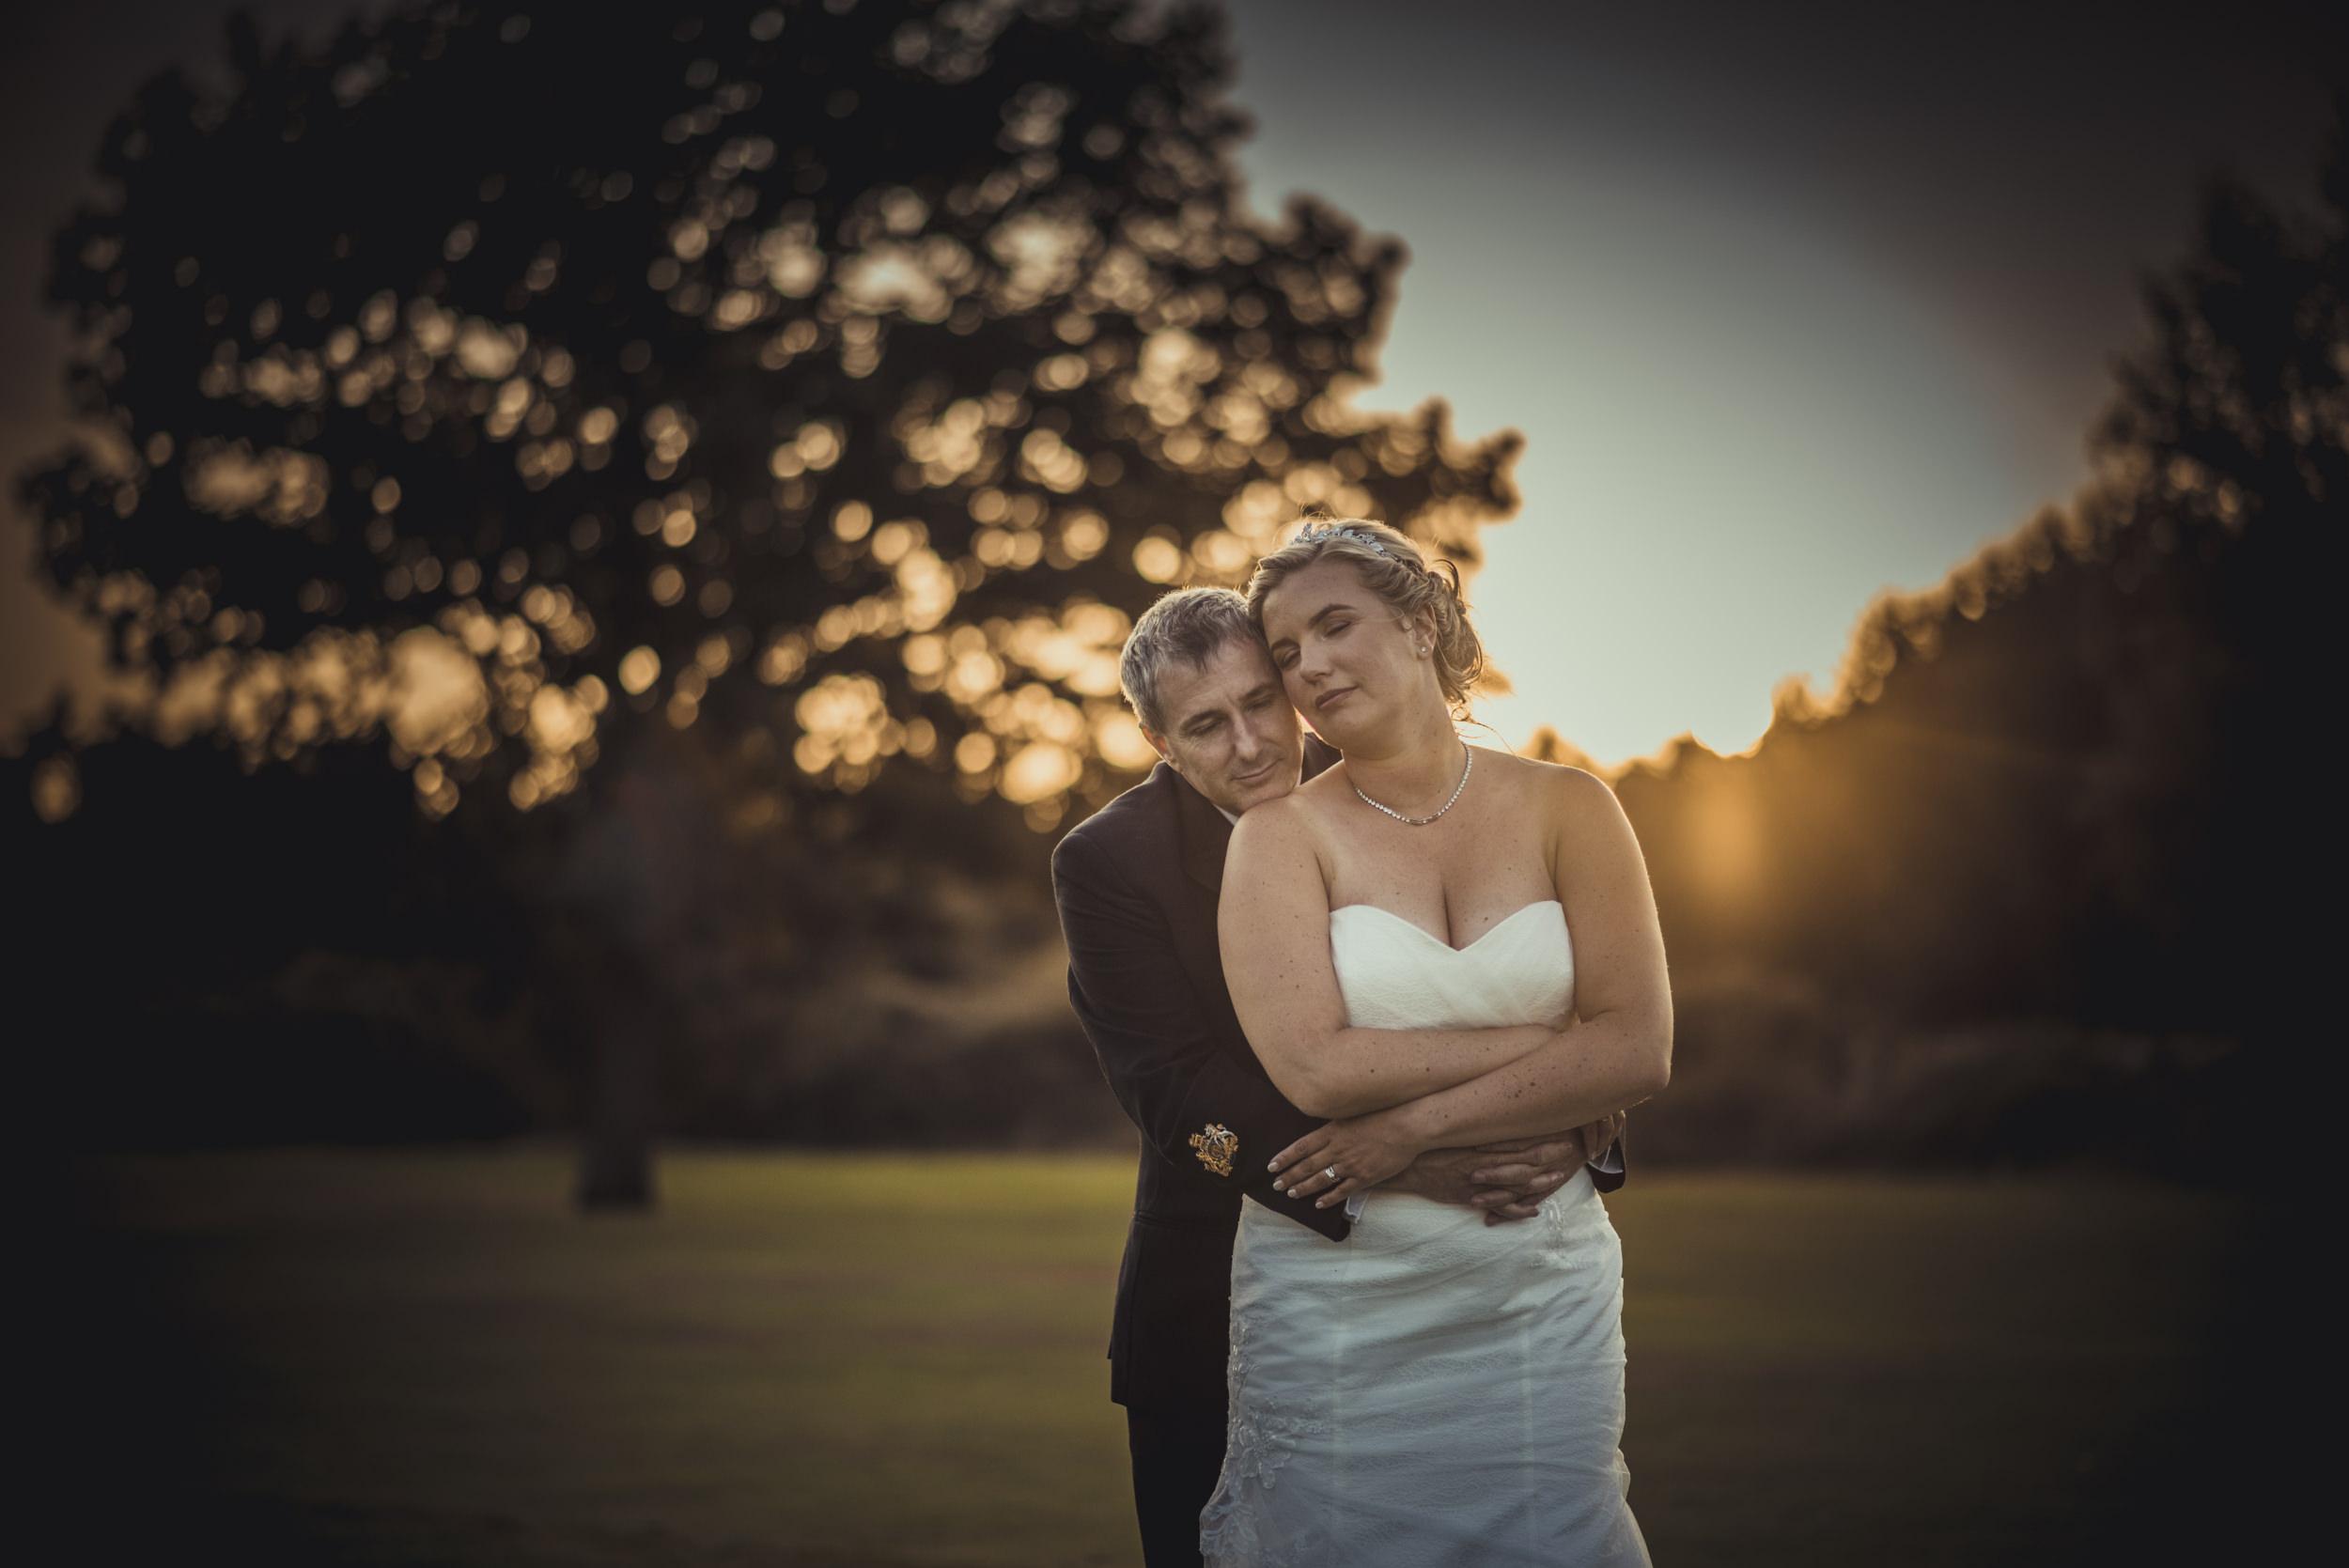 Chantelle-and-Stephen-Old-Thorns-Hotel-Wedding-Liphook-Manu-Mendoza-Wedding-Photography-507.jpg